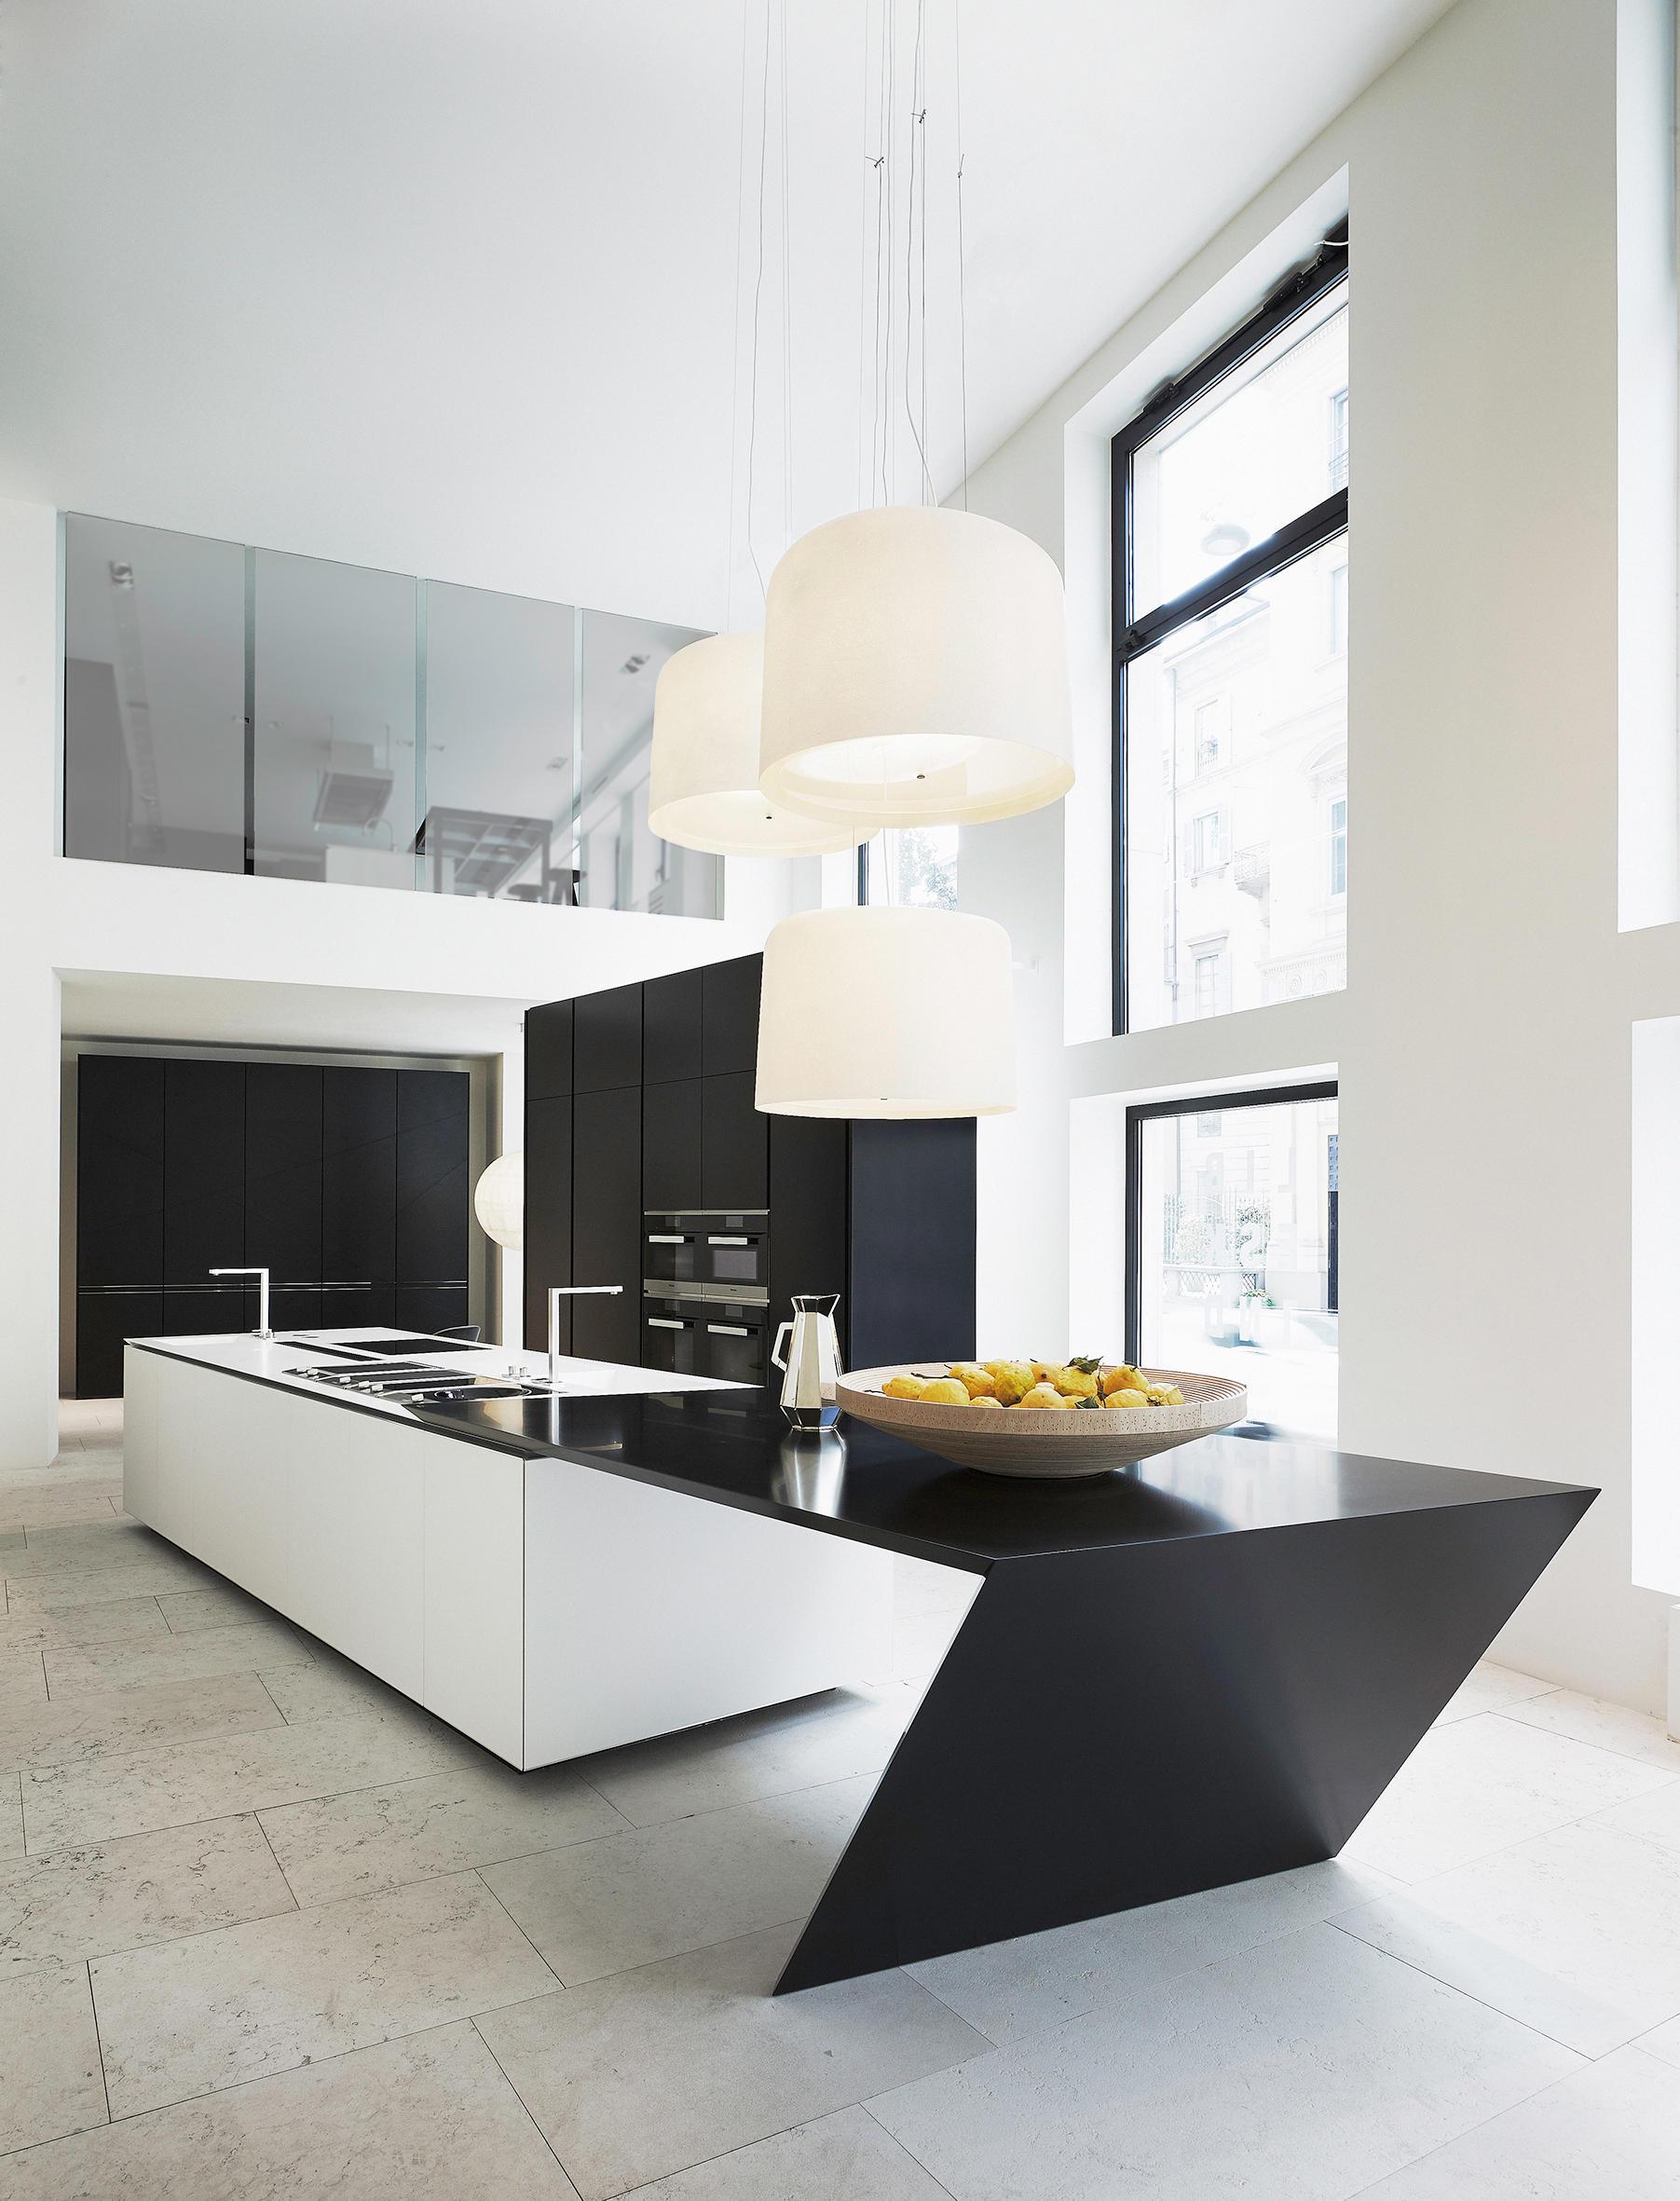 Kücheninseln | wotzc.com